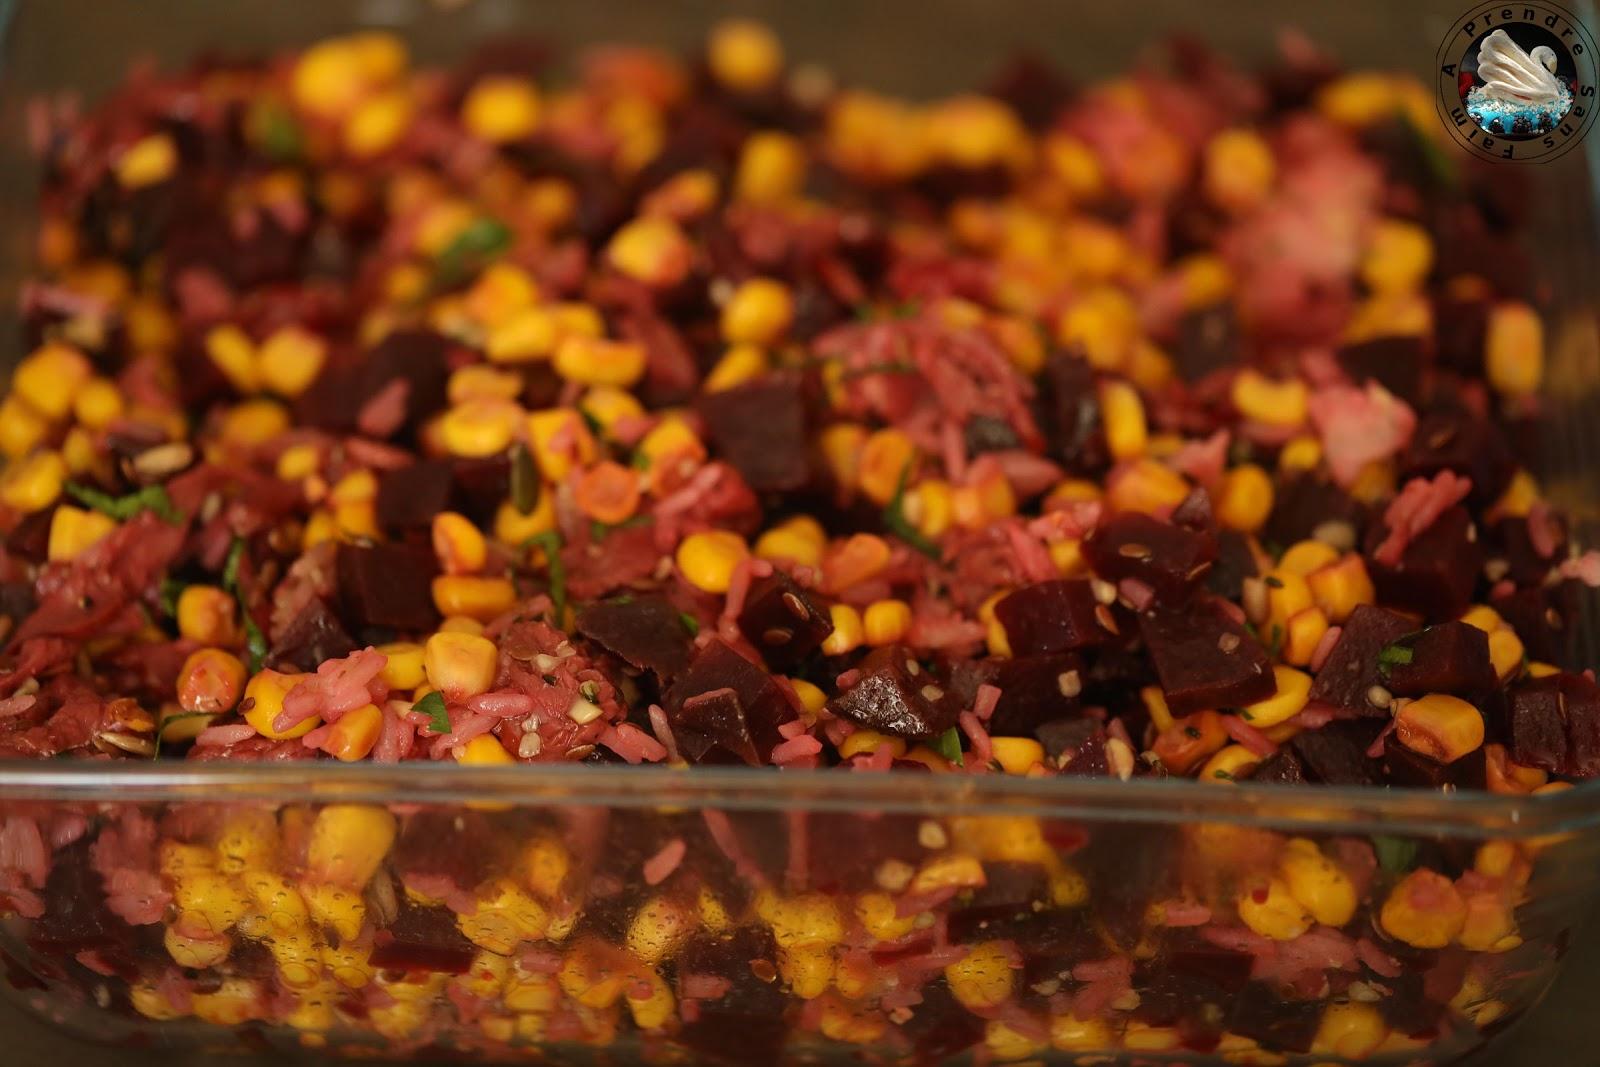 Salade de riz au magret de canard séché